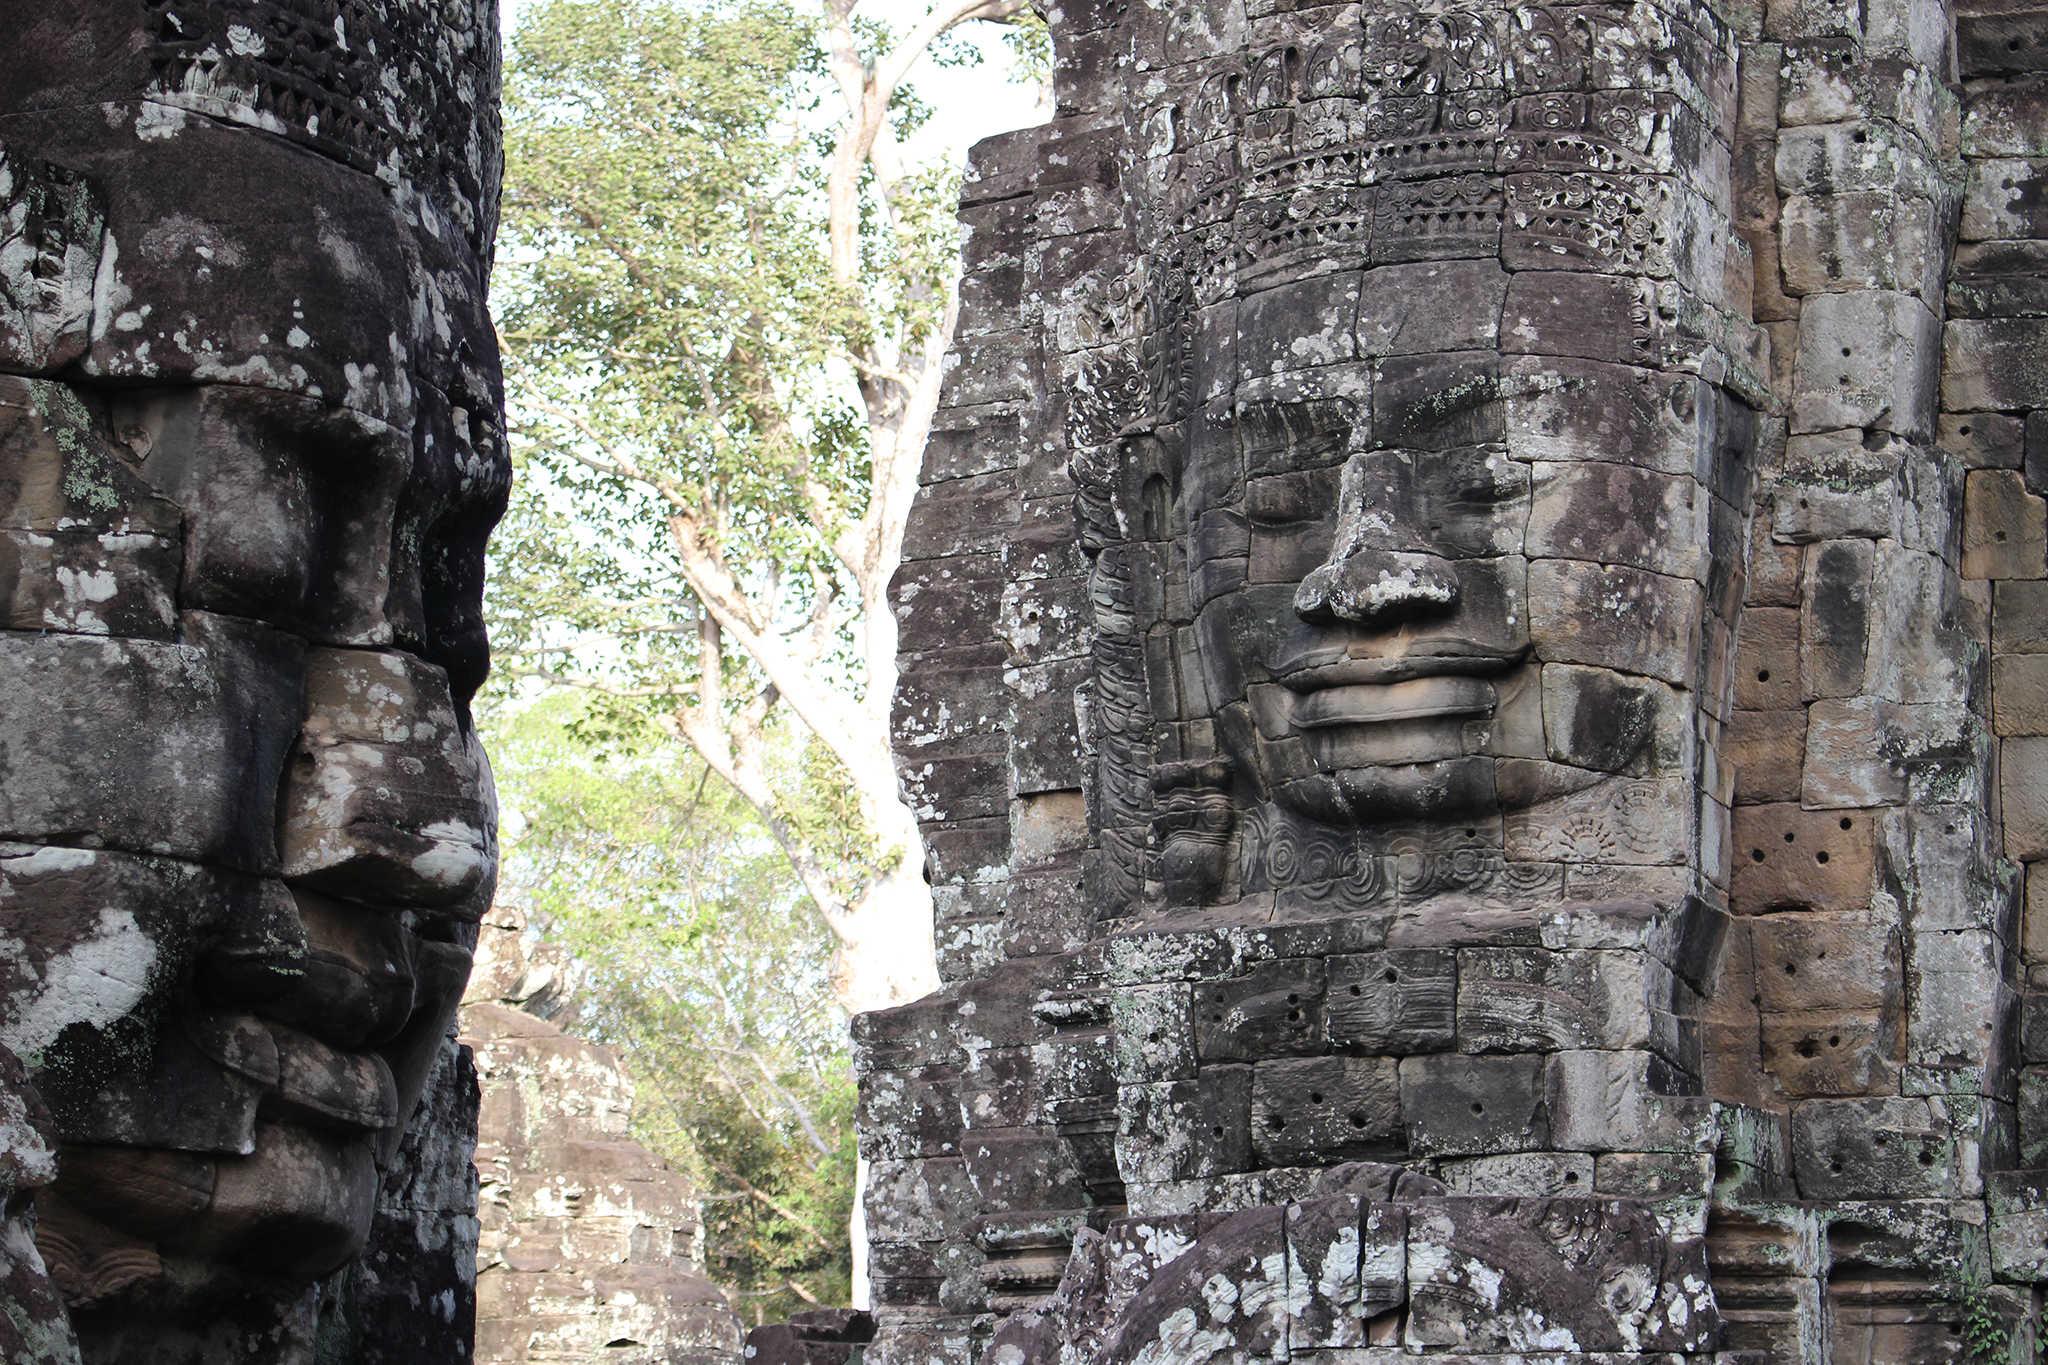 Bayon visages de bouddha